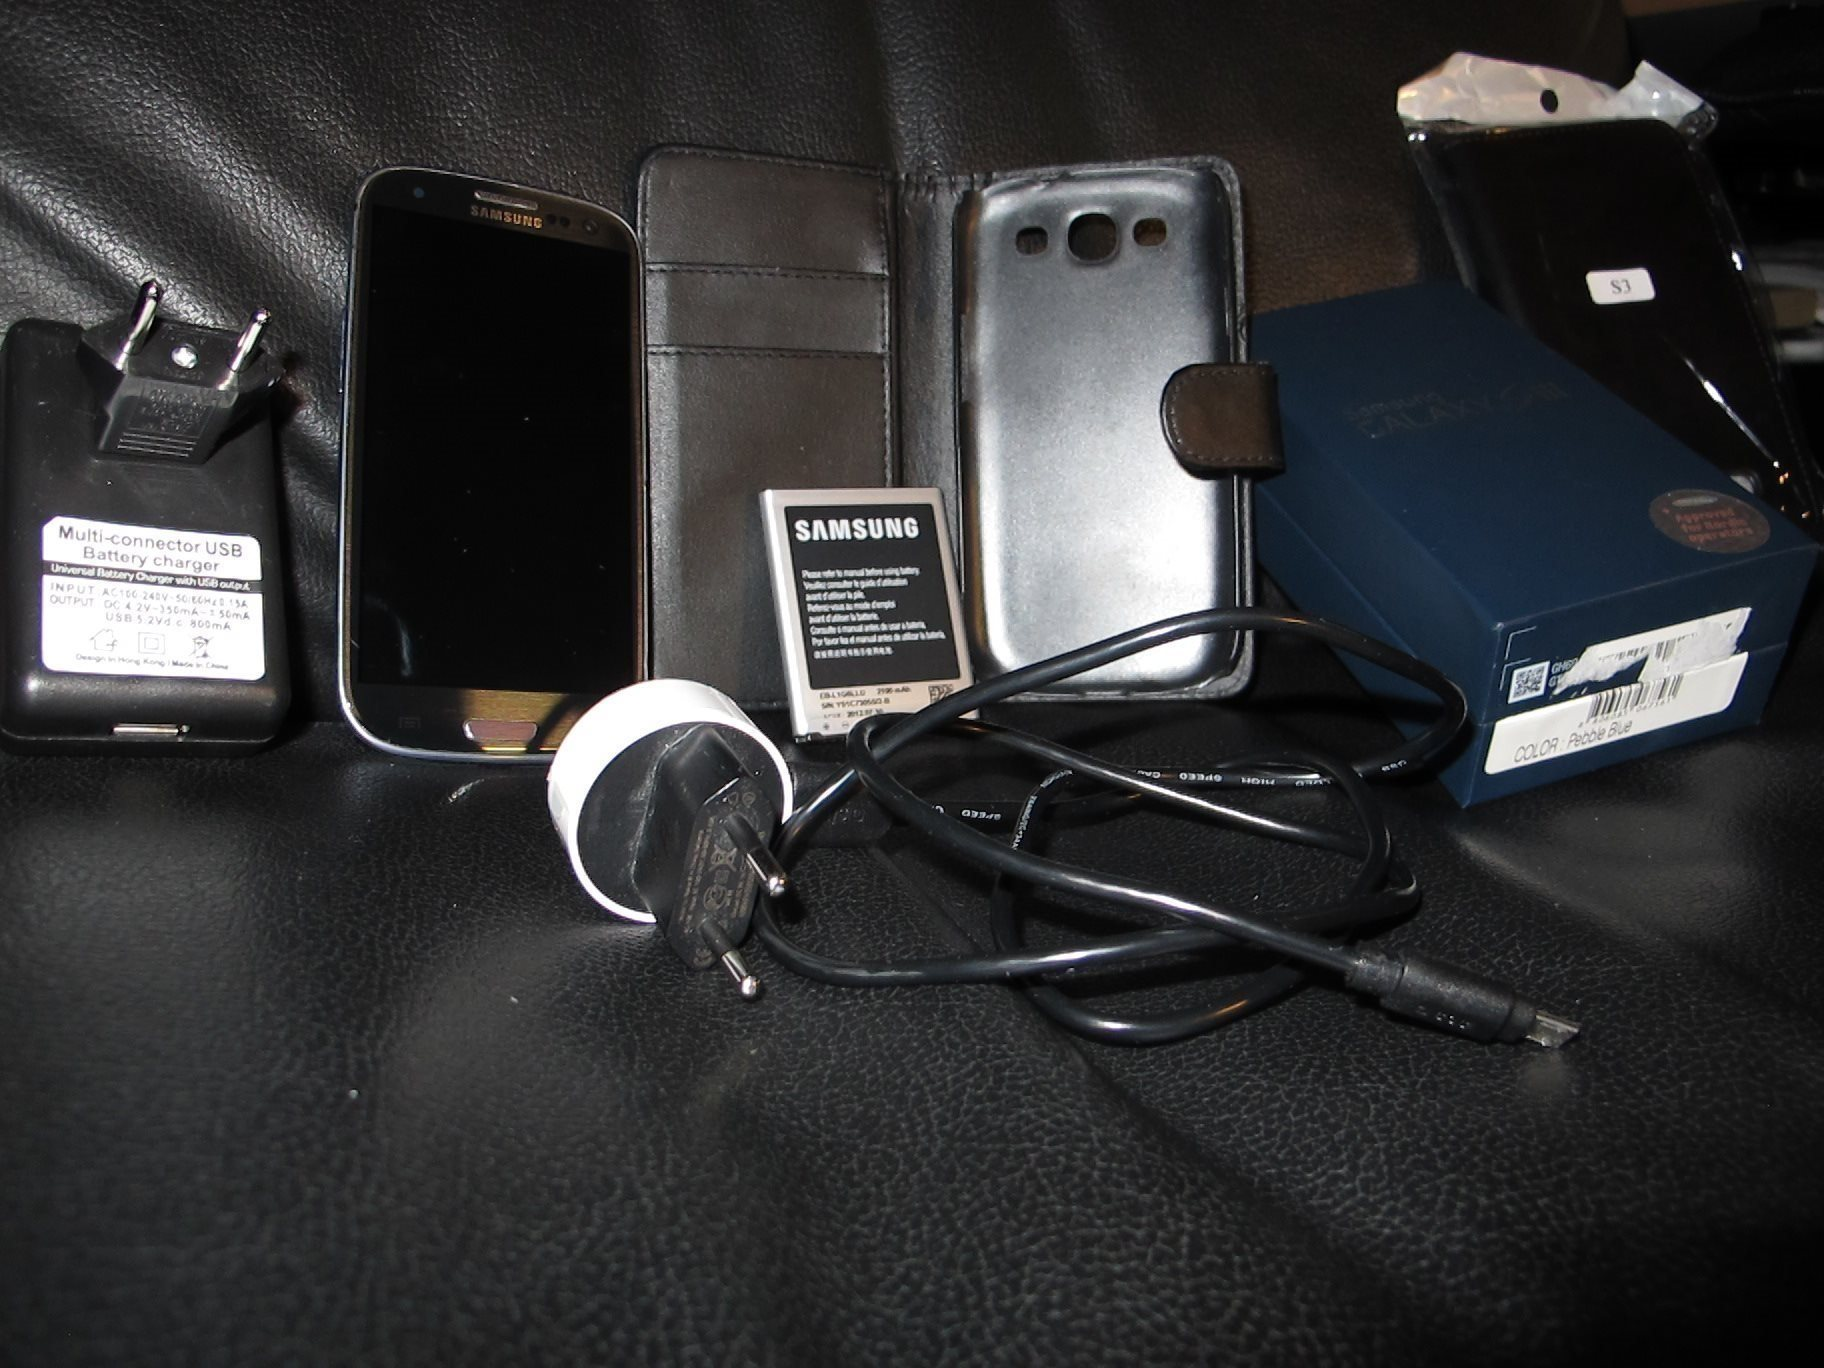 Samsung Galaxy S3 16GB. Modell:GT I9300. Pebbl.. (340645565